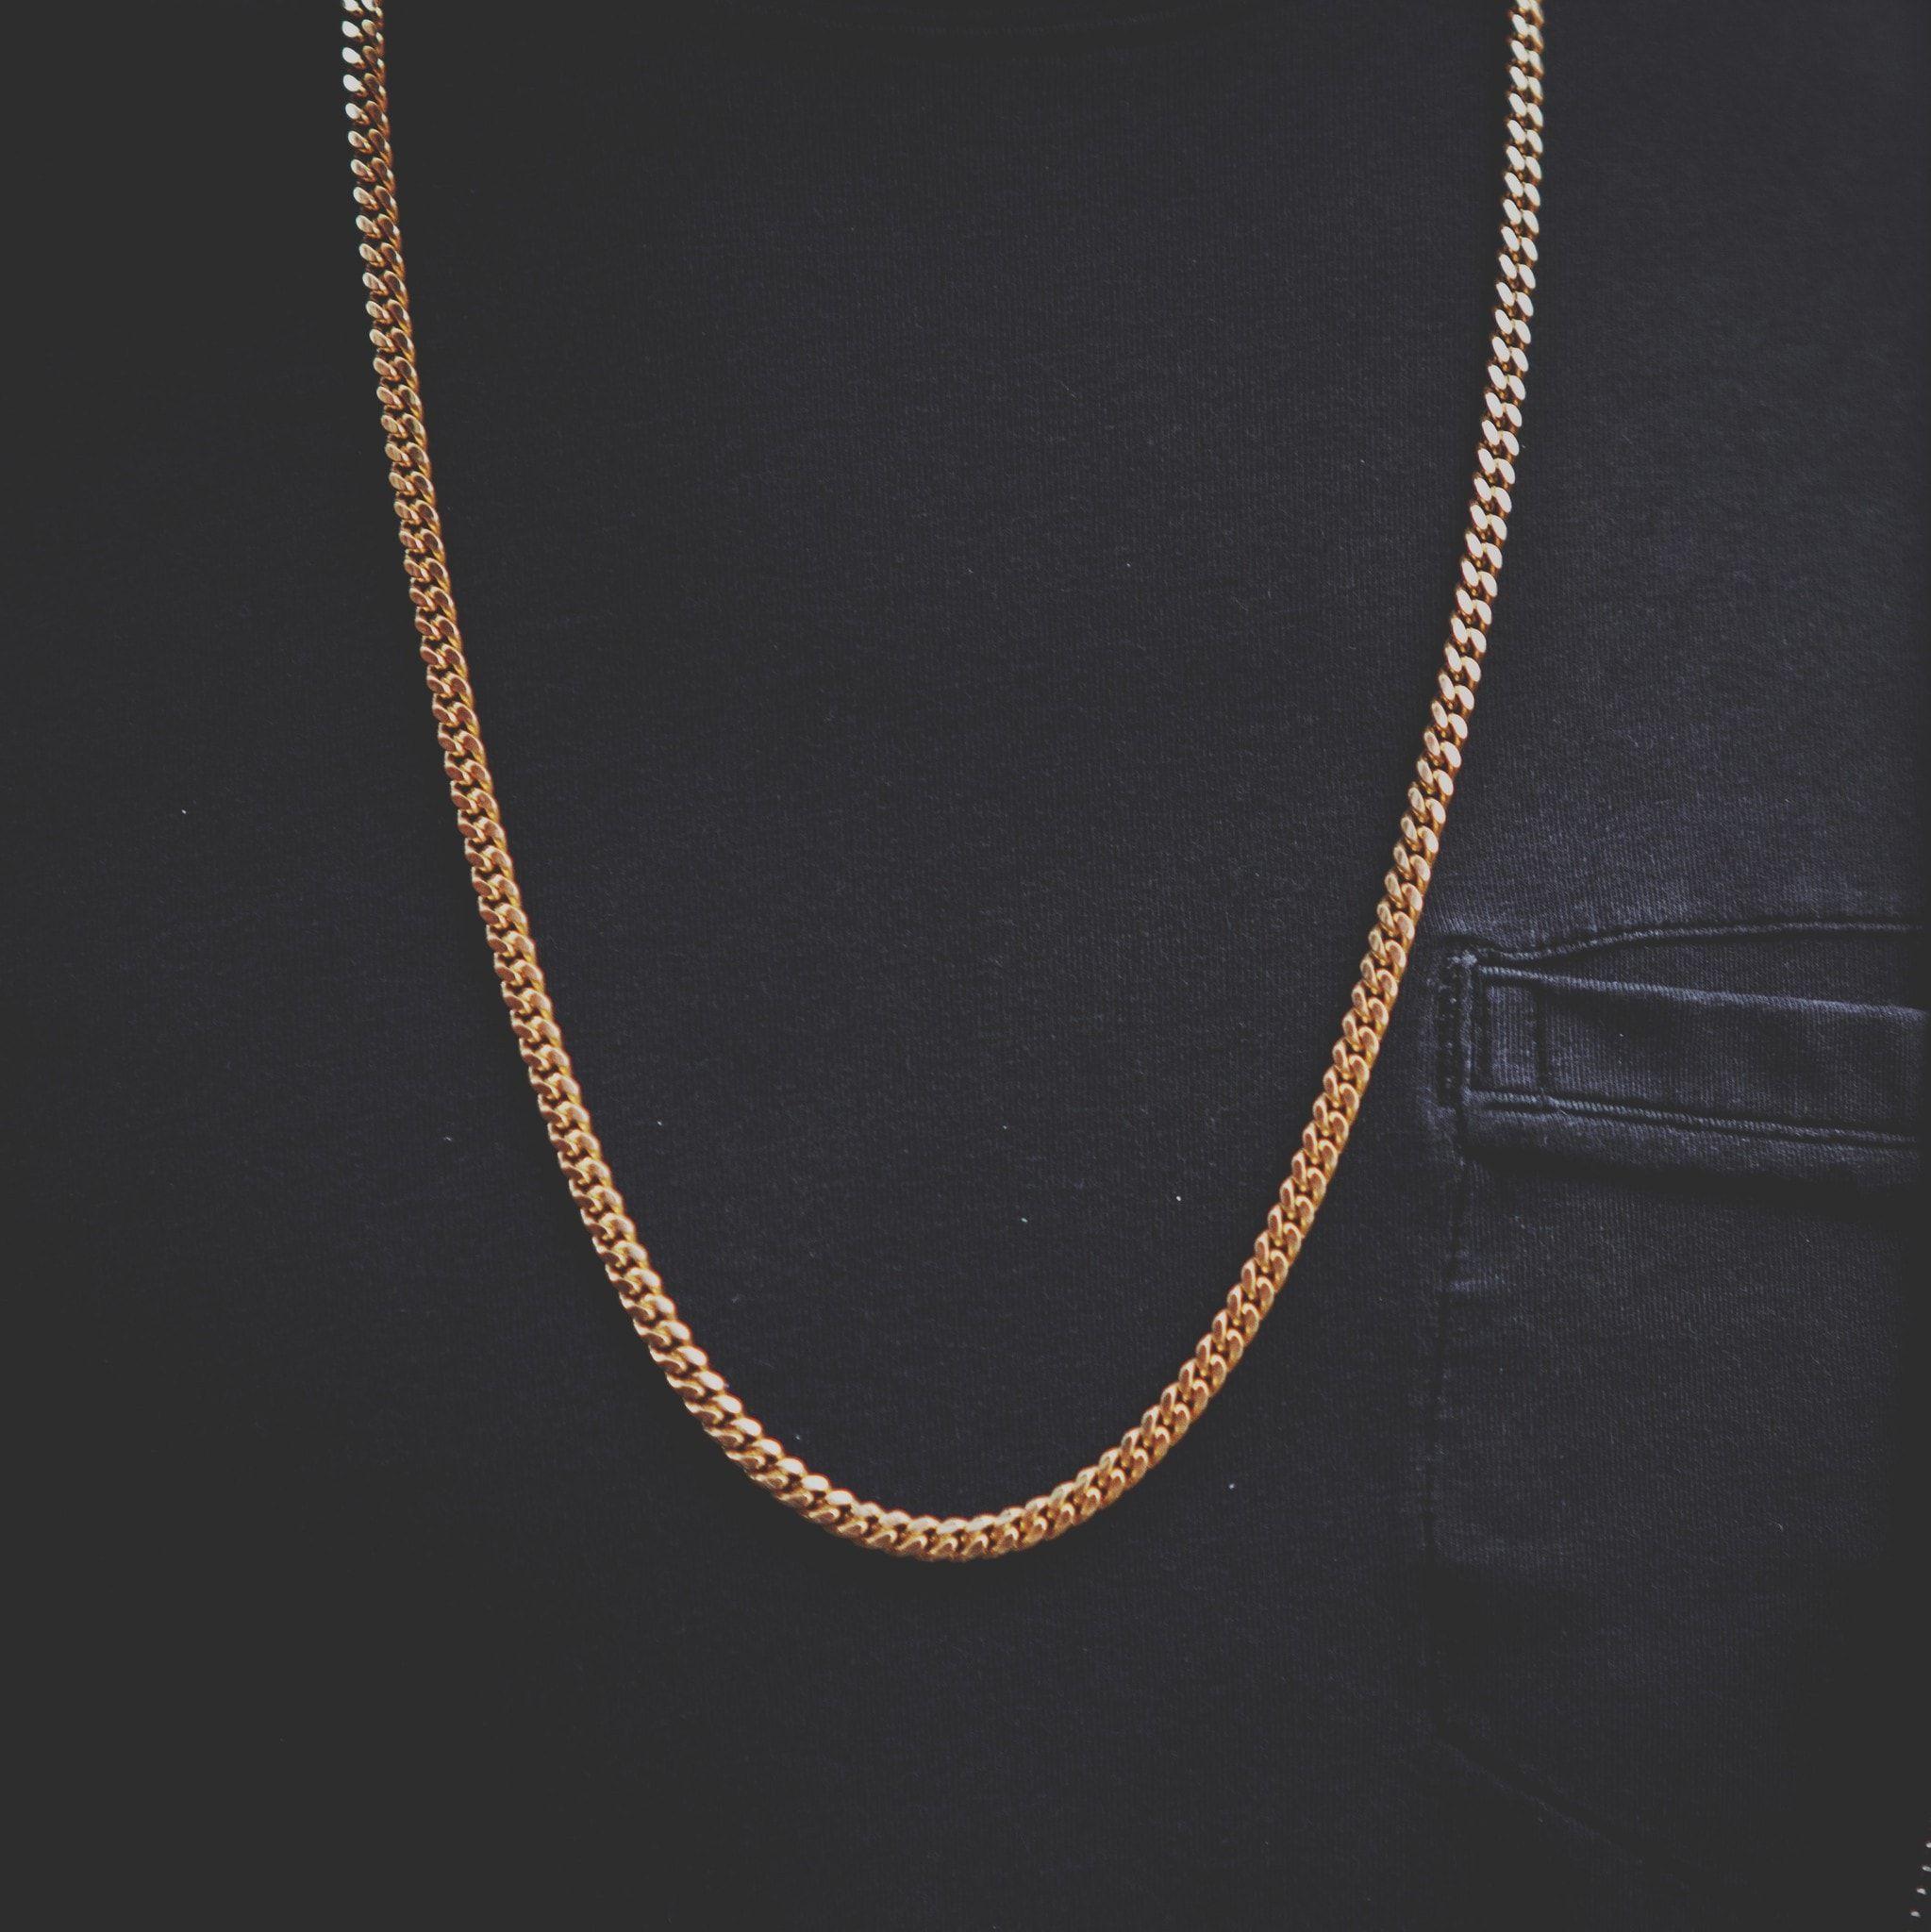 6a045d67d7146 5mm Miami Cuban Link Chain in 2019 | רעיונות לשרשרת | Chain, Gold ...